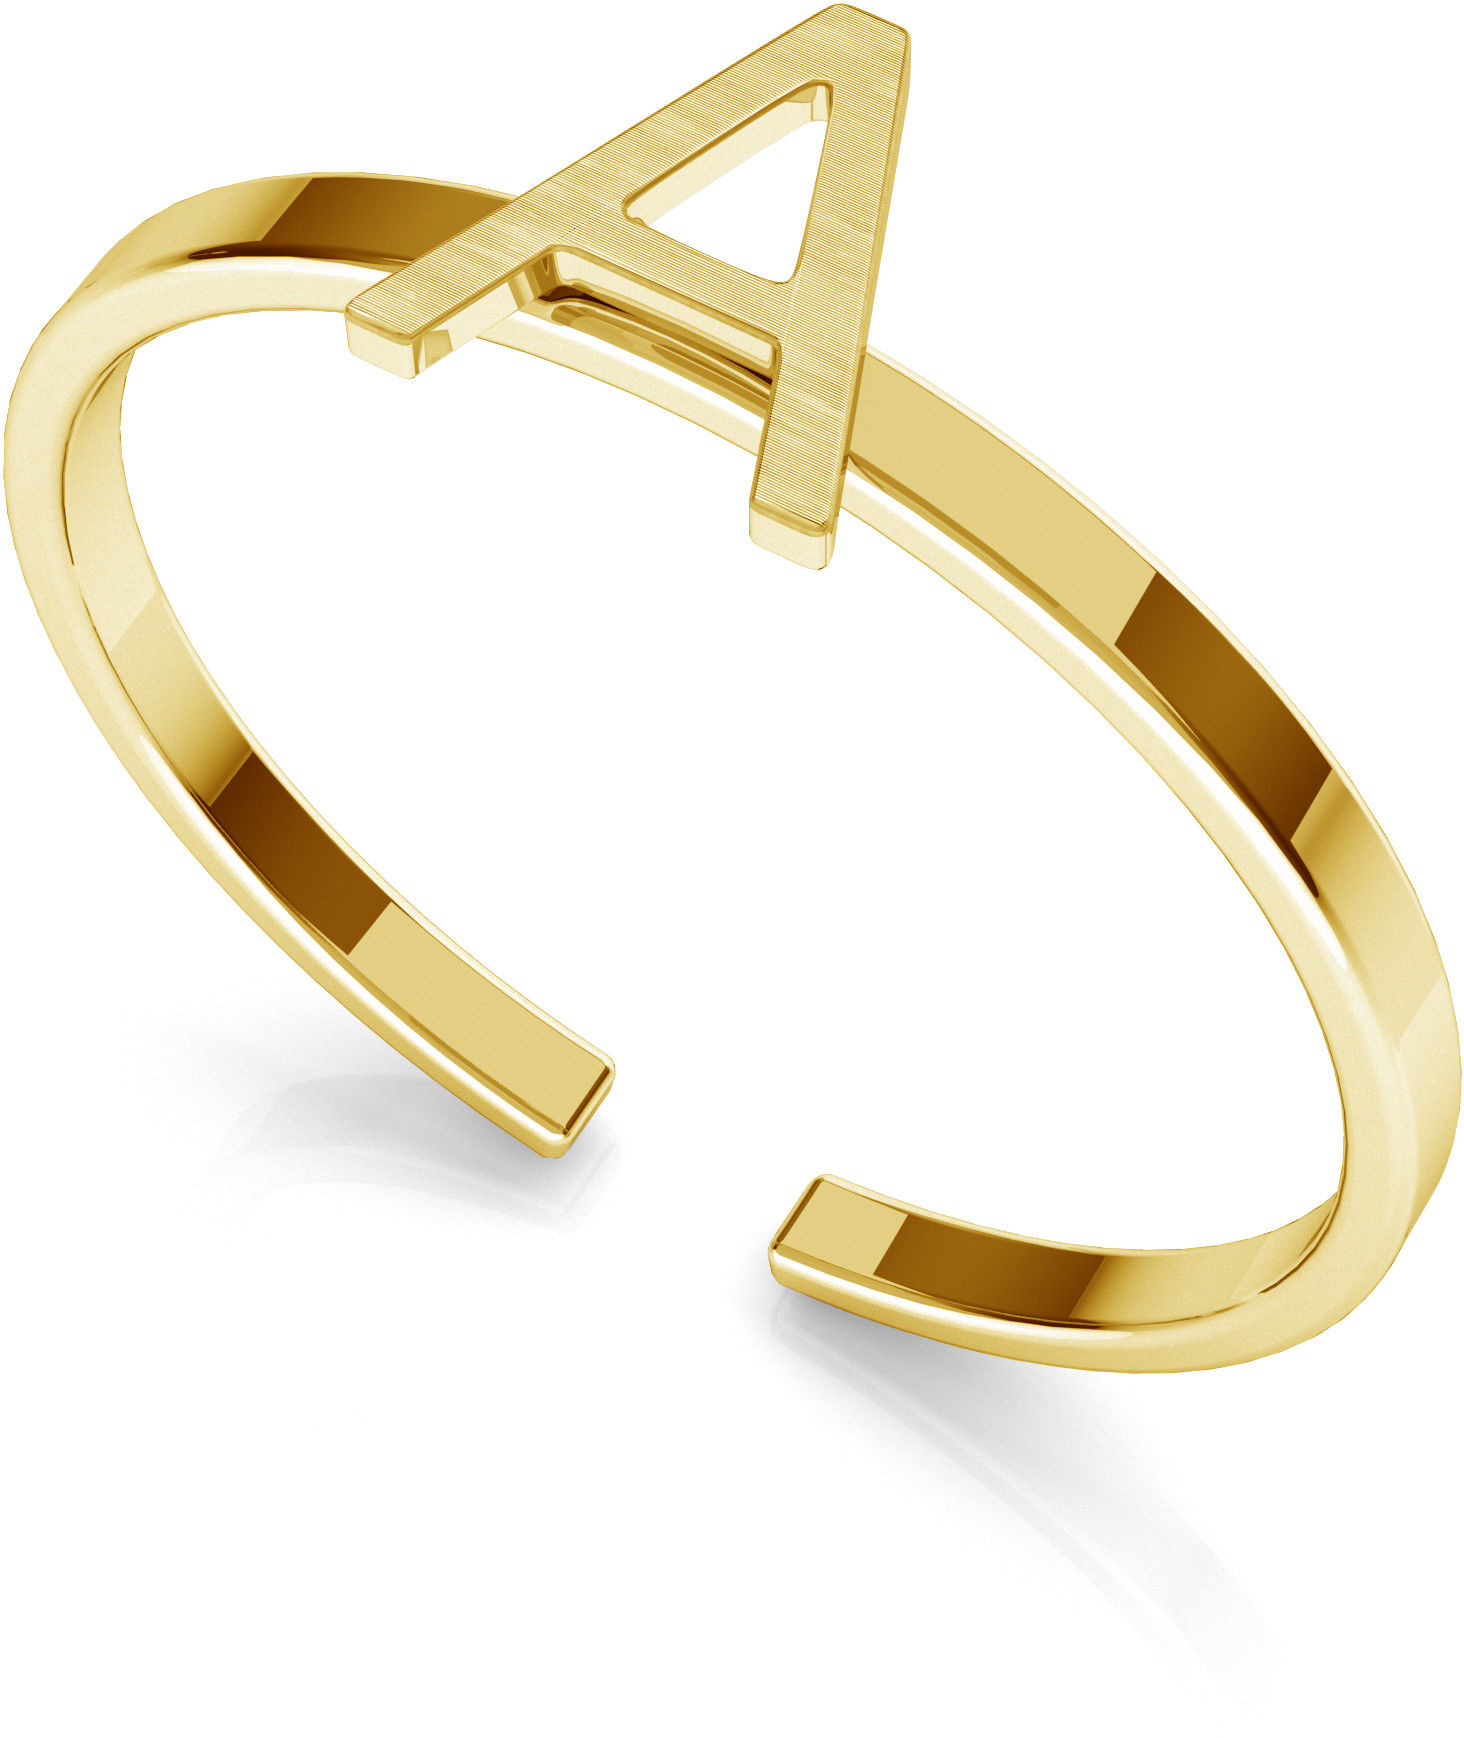 Srebrny pierścionek z literką My RING, srebro 925 : Litera - A, Srebro - kolor pokrycia - Pokrycie żółtym 18K złotem